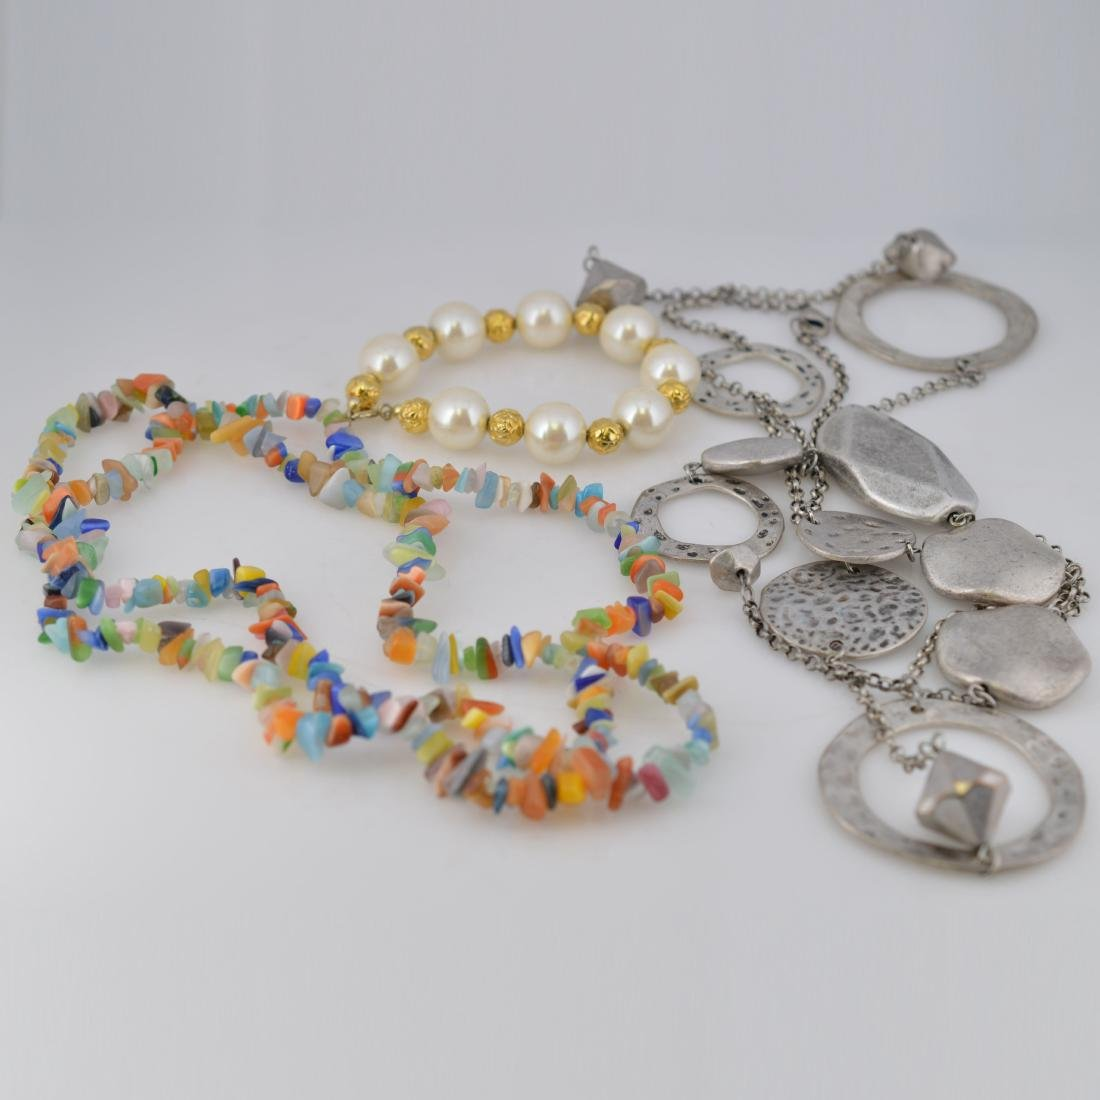 Silver Necklace + Pearl Bracelet + Color-Gem Necklace - 2